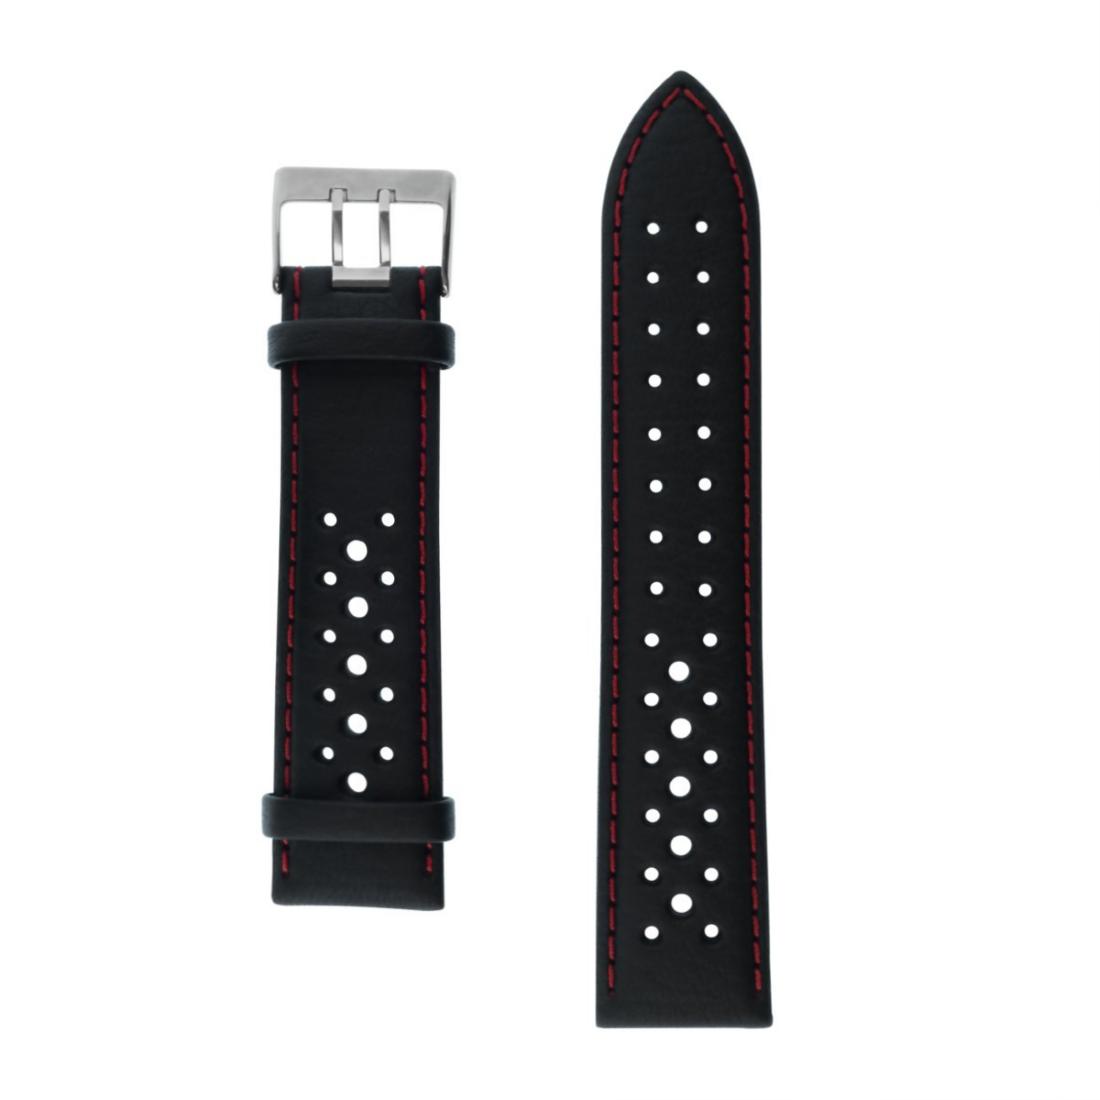 Uhrenarmband Armband Leder gelocht 22 mm Breit schwarz Naht rot von Junkers